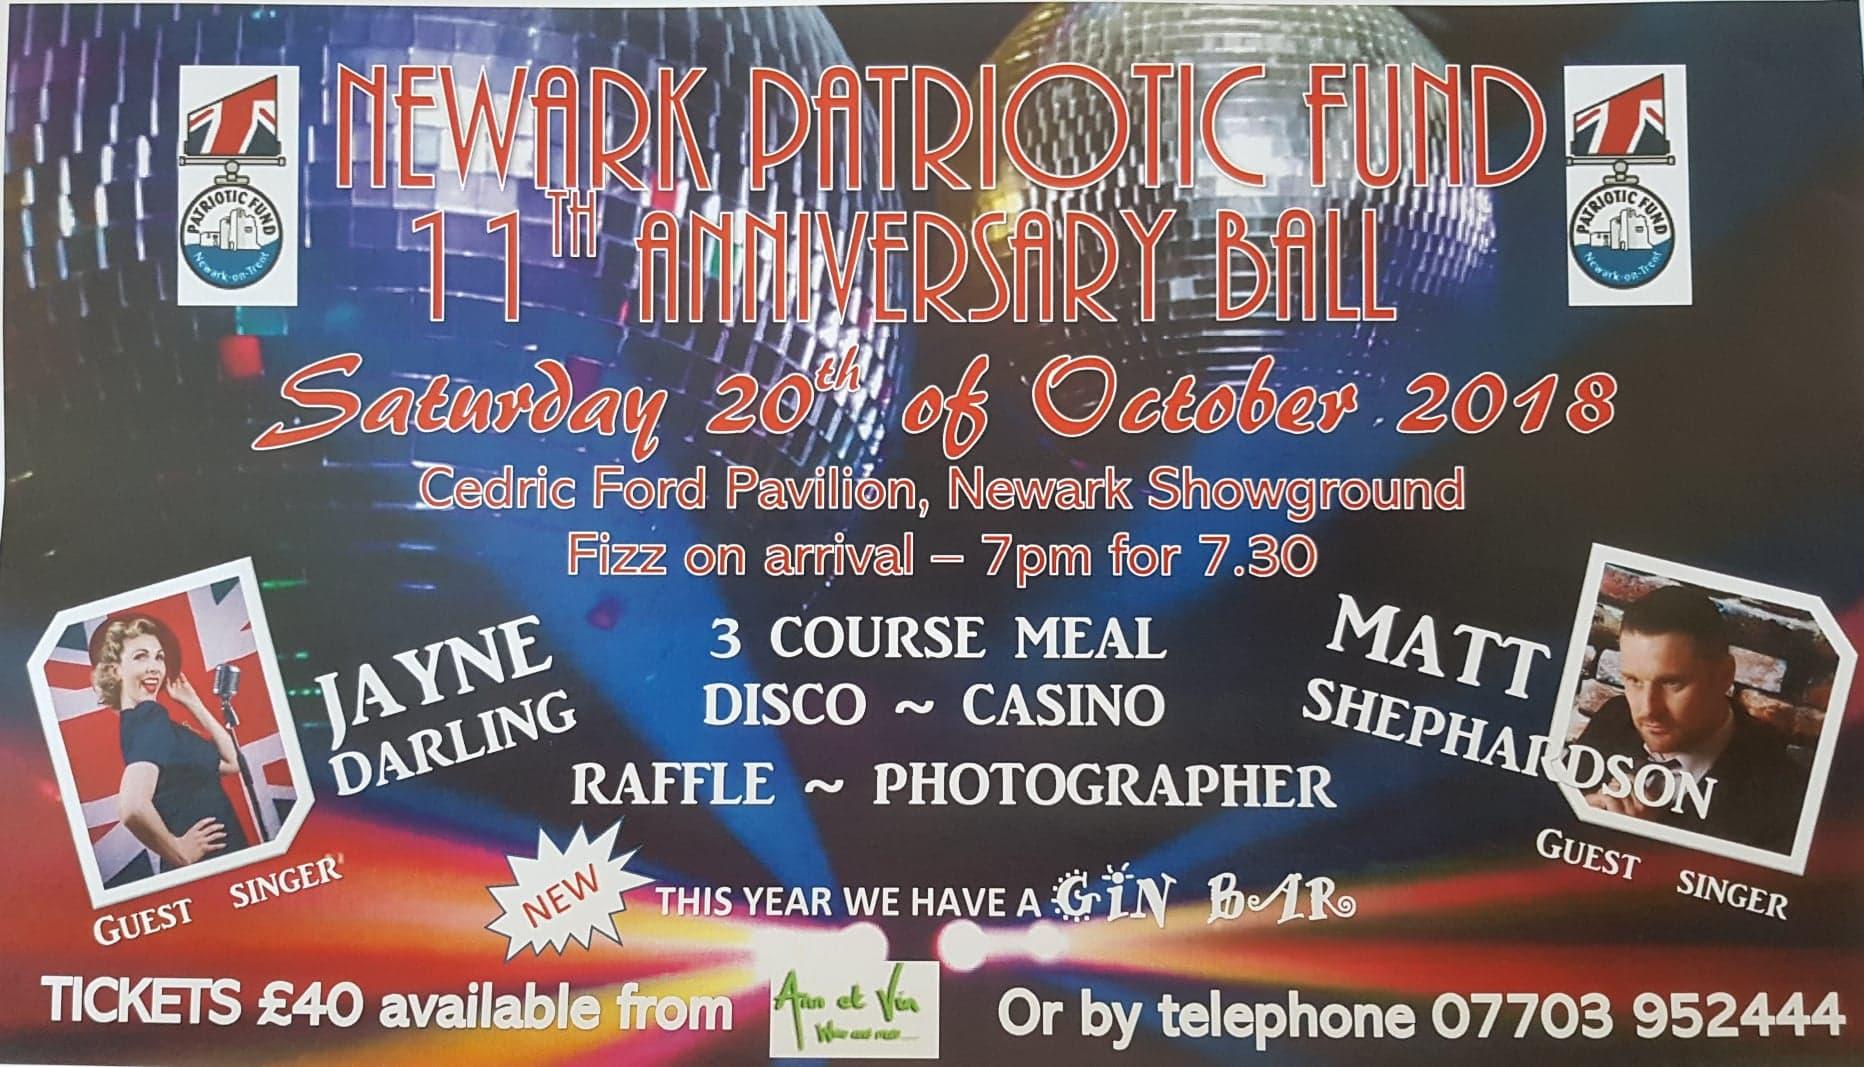 Newark Patriotic Fund 11th Anniversary Ball